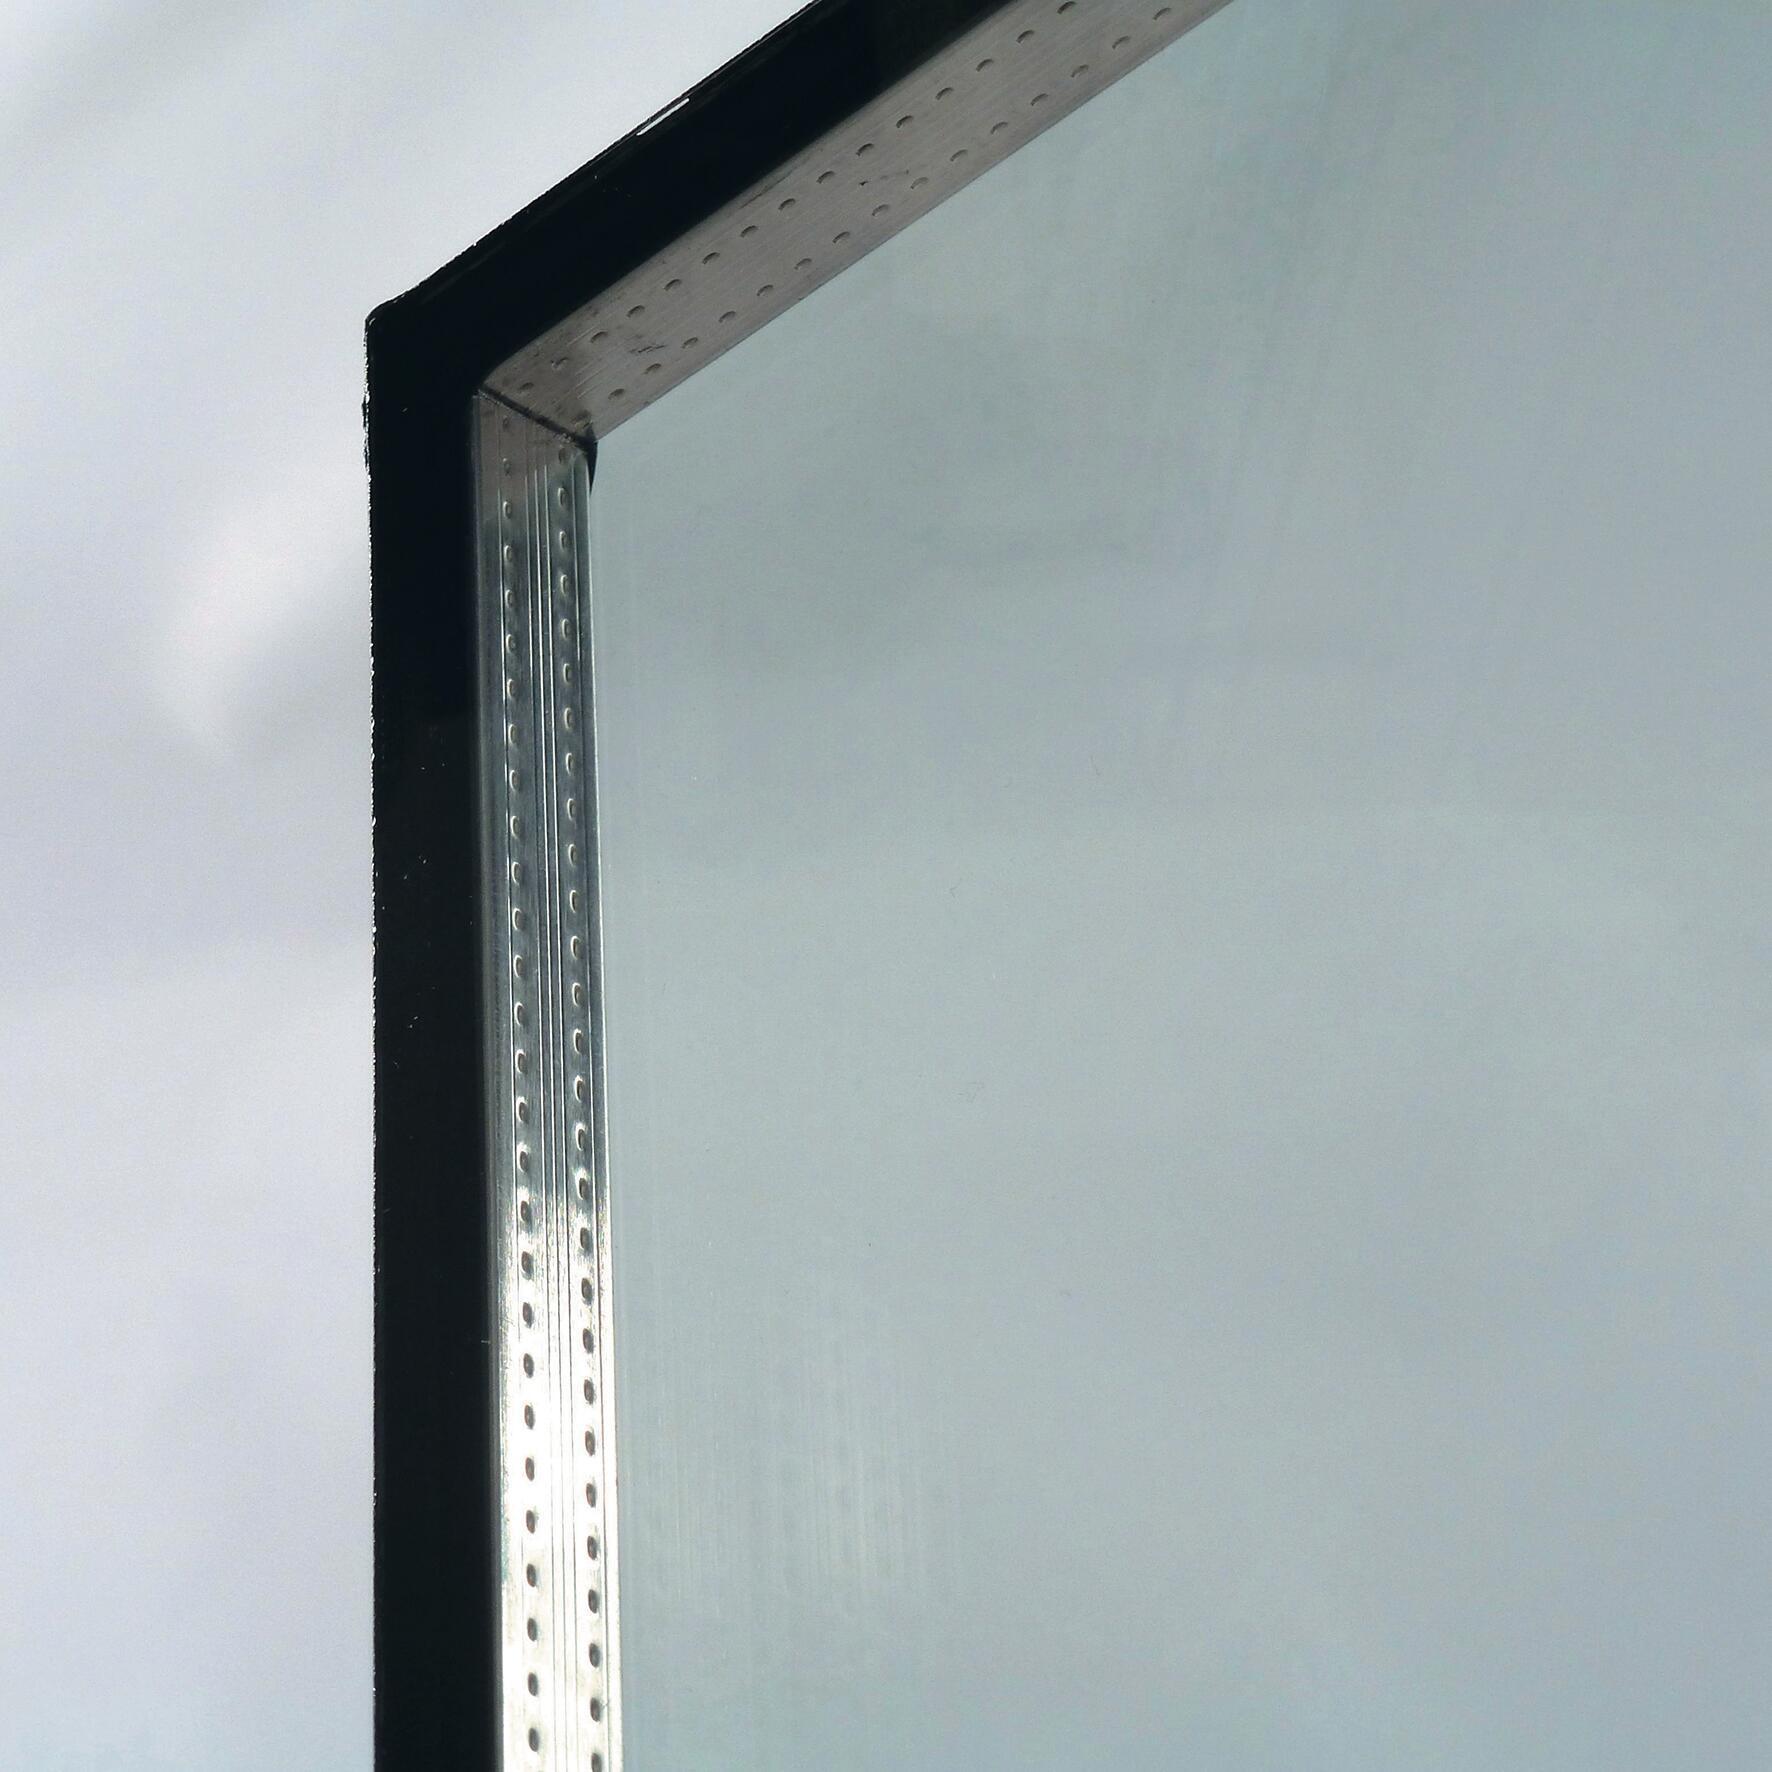 Vetro doppio stratificato trasparente Sp 23 mm